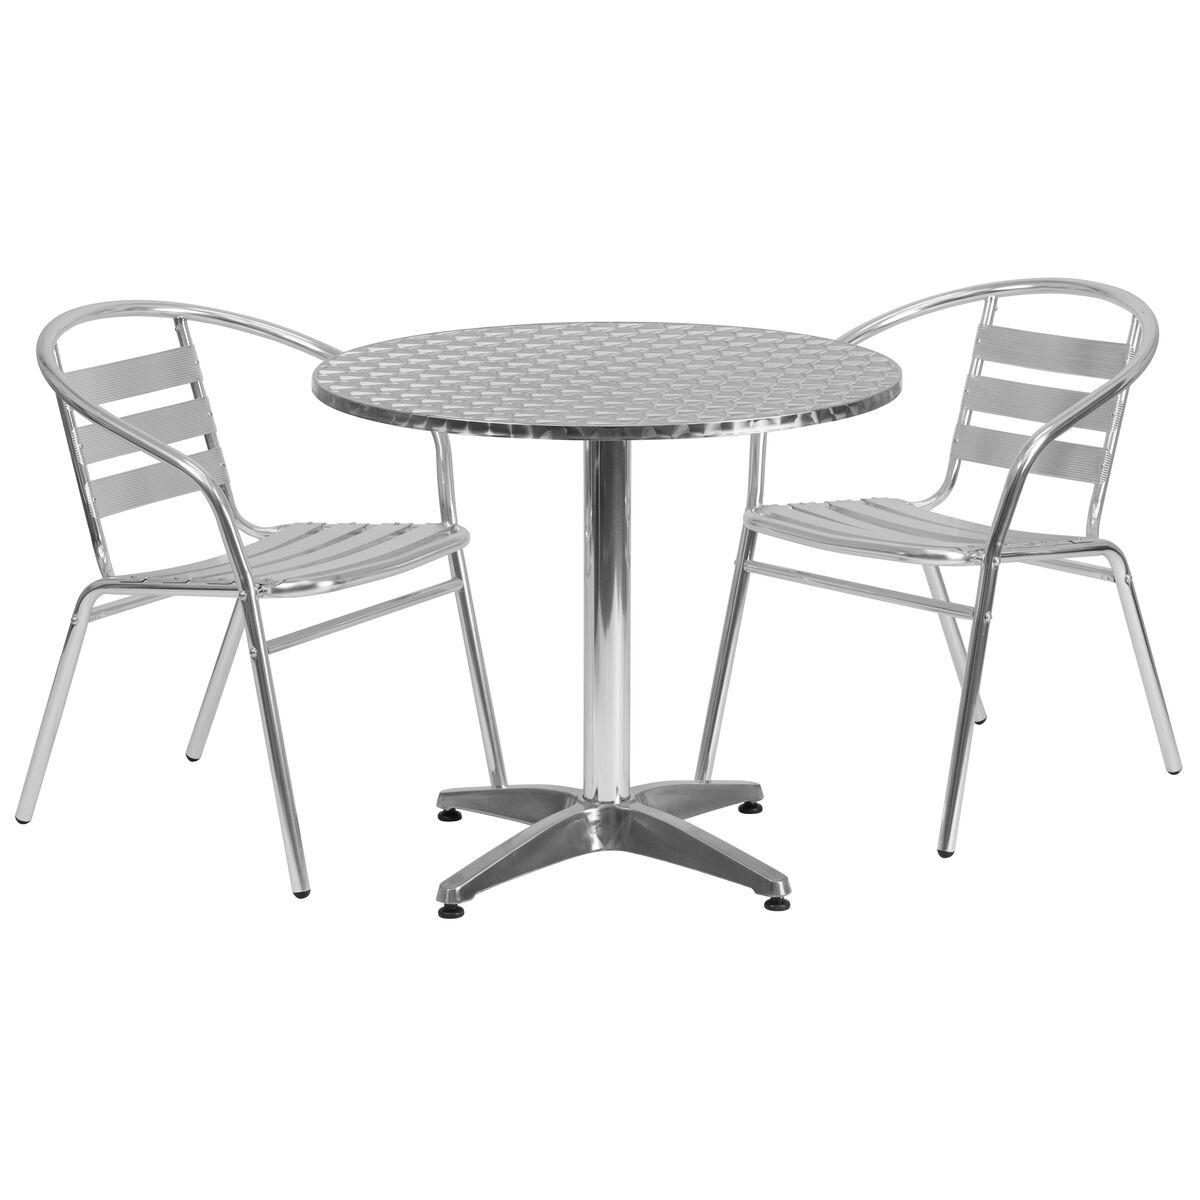 31 5rd aluminum table set tlh alum 32rd 017bchr2 gg